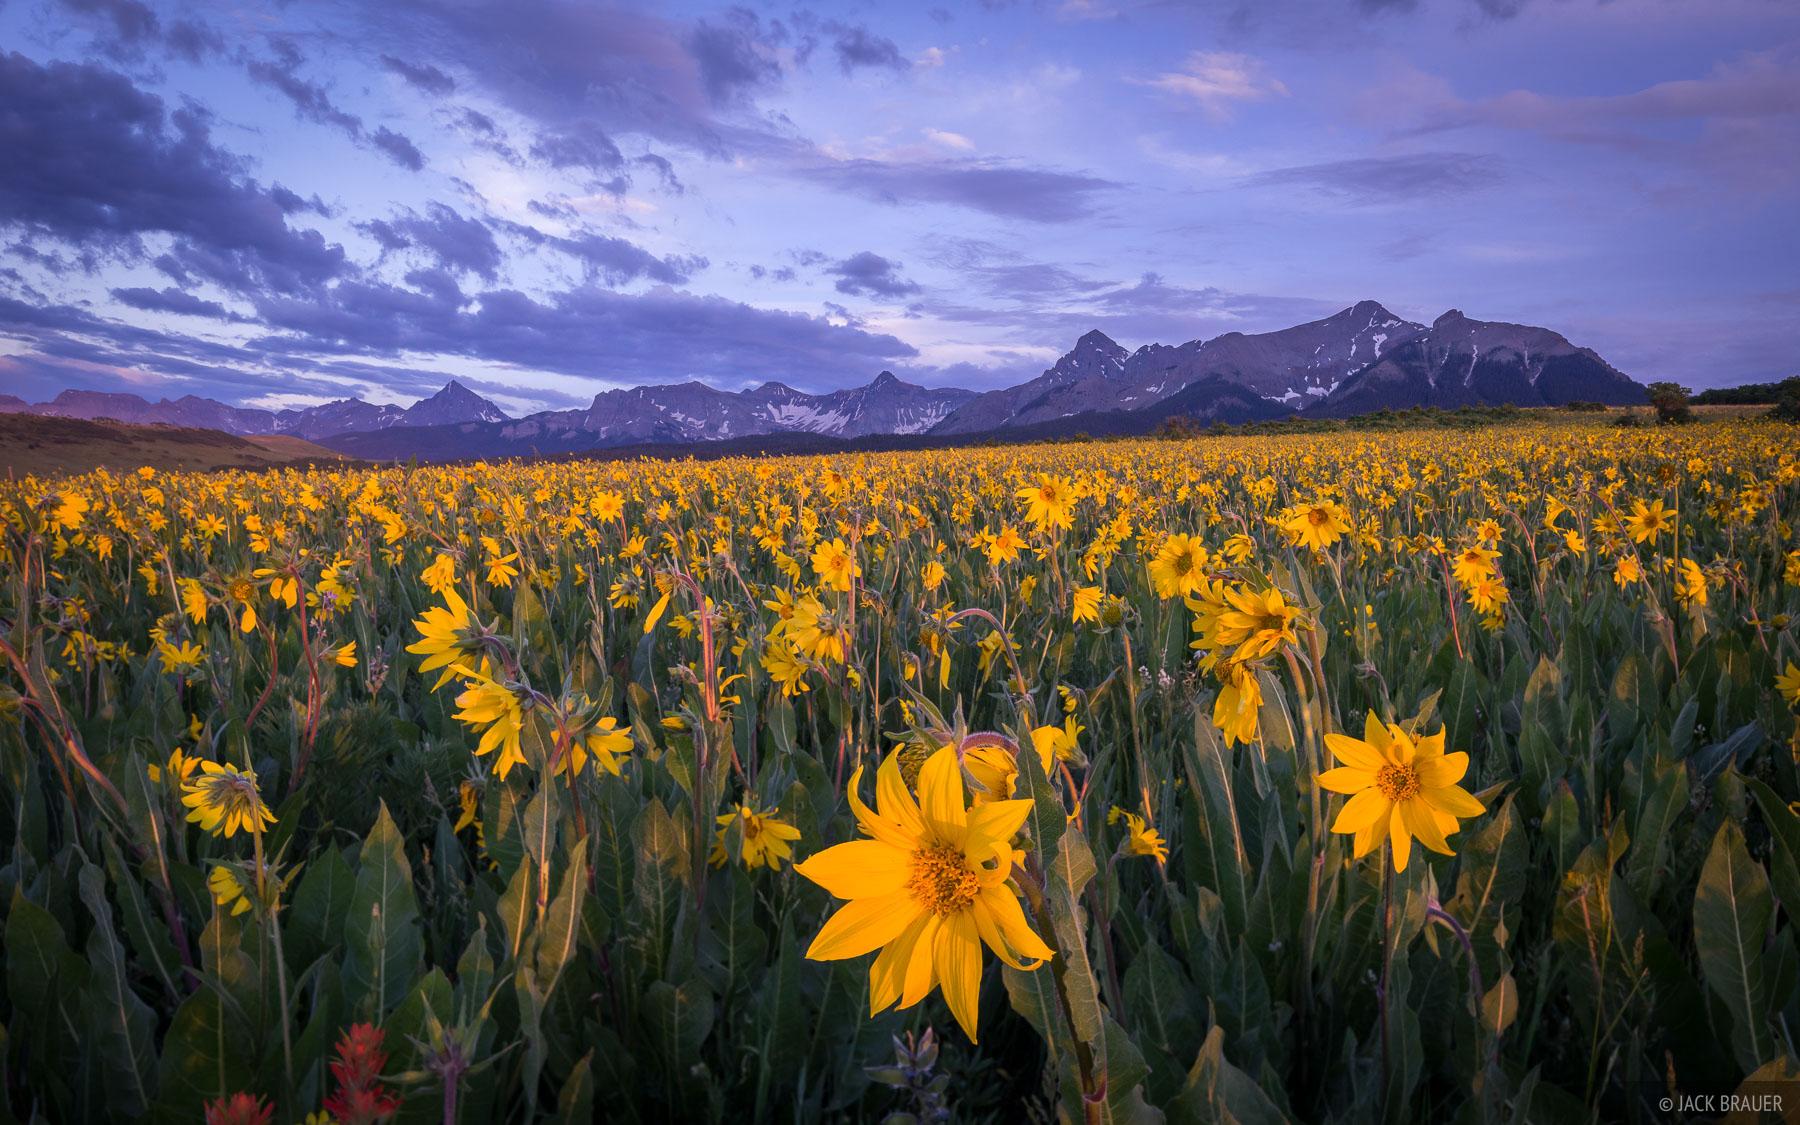 Colorado,San Juan Mountains,Sneffels Range,wildflowers, sunset, July, photo